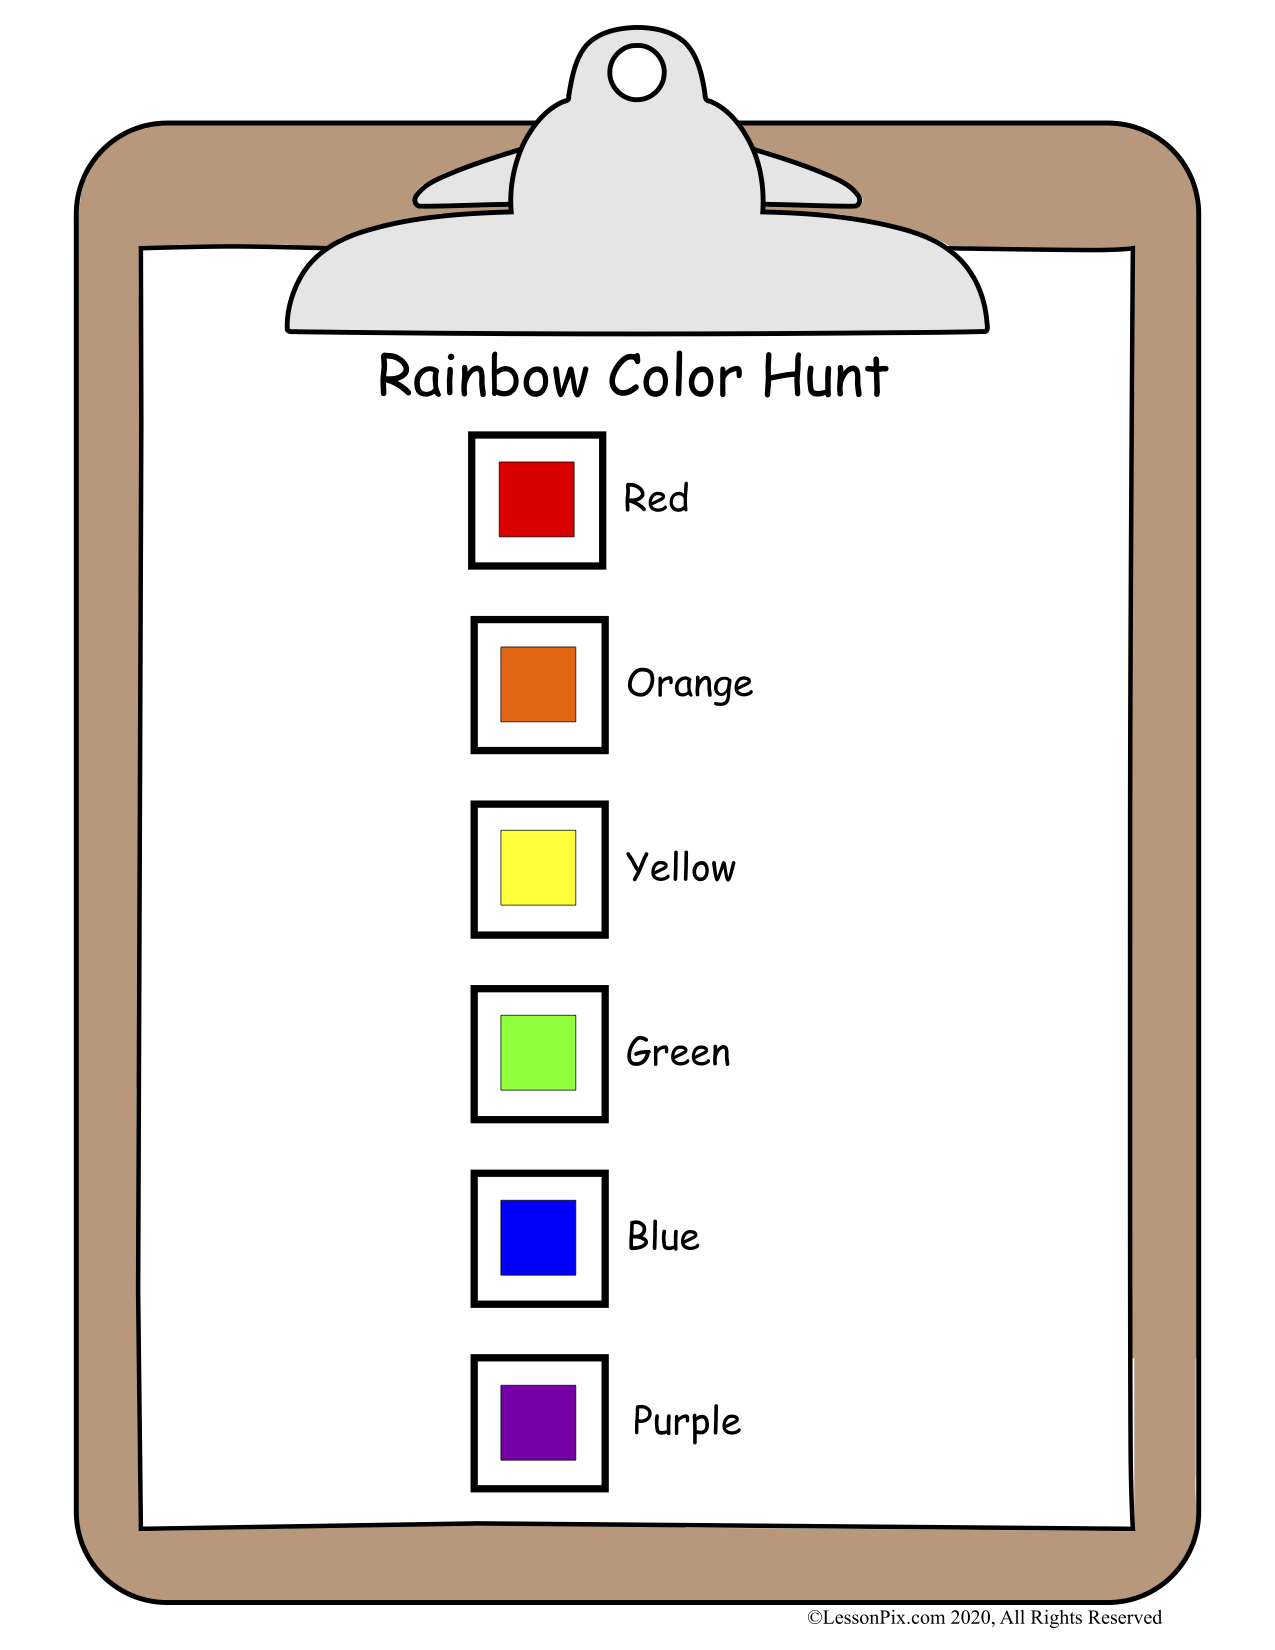 Rainbow Color Hunt